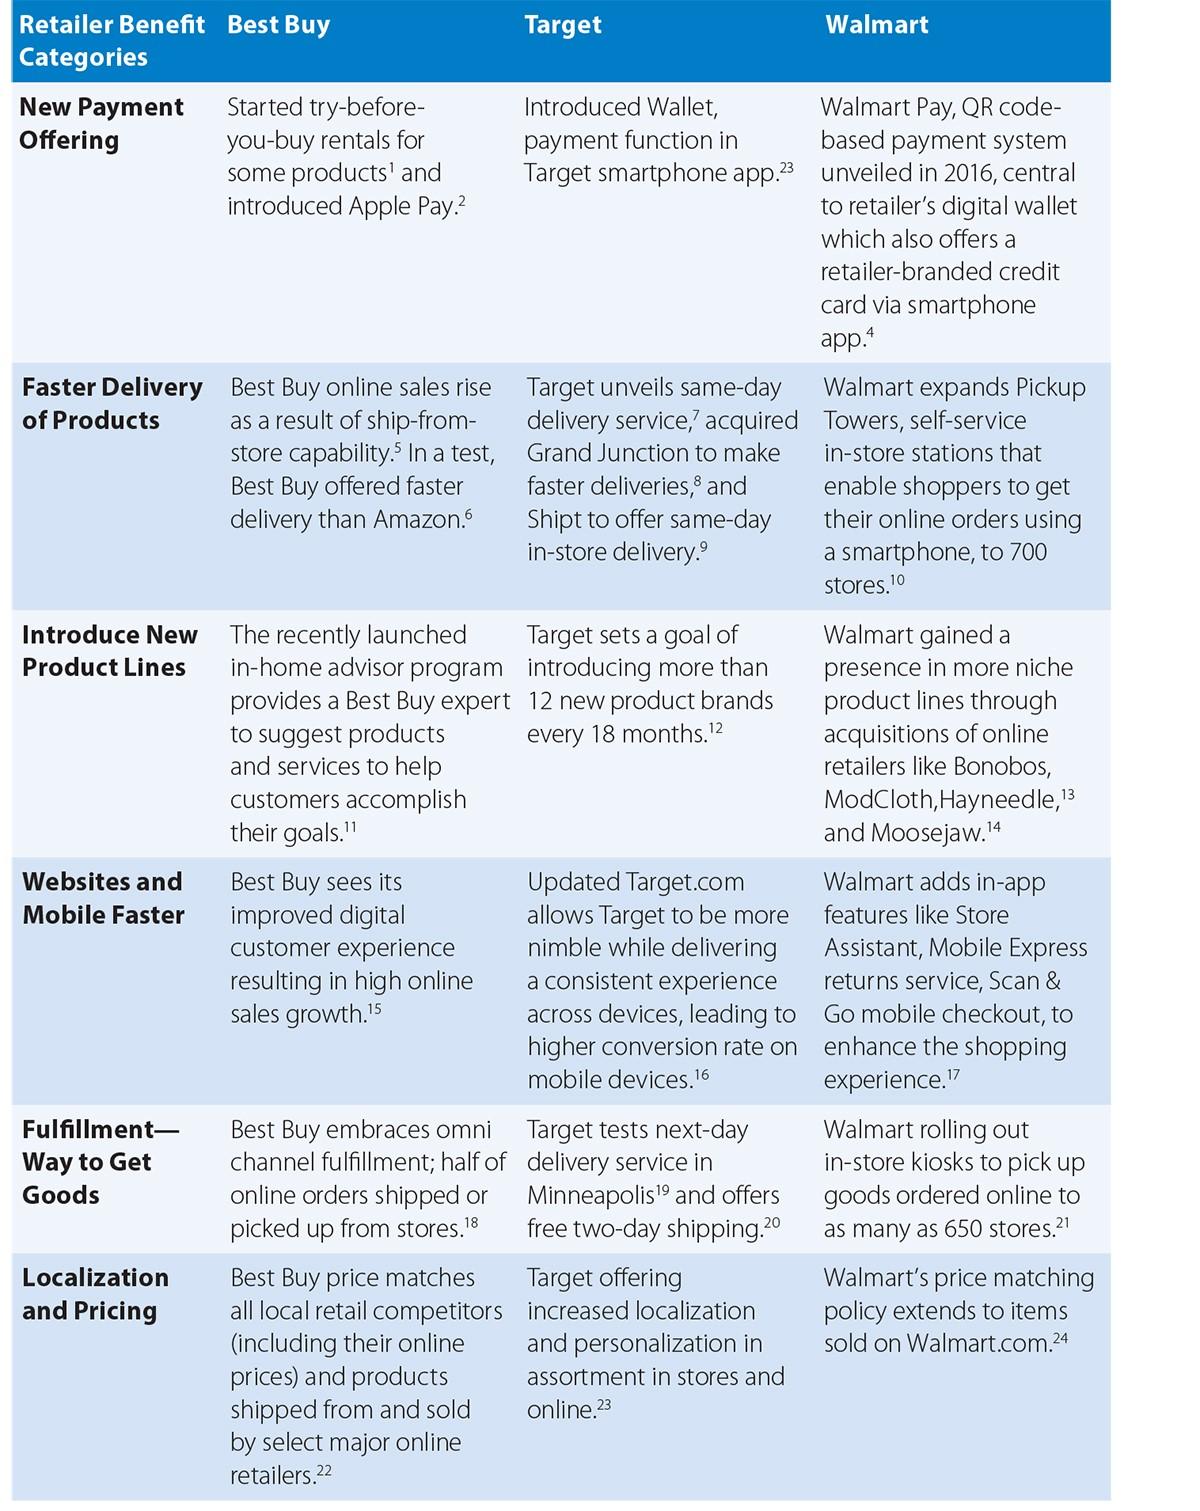 Retail Agility: Benefits of Agile Adoption in Retail